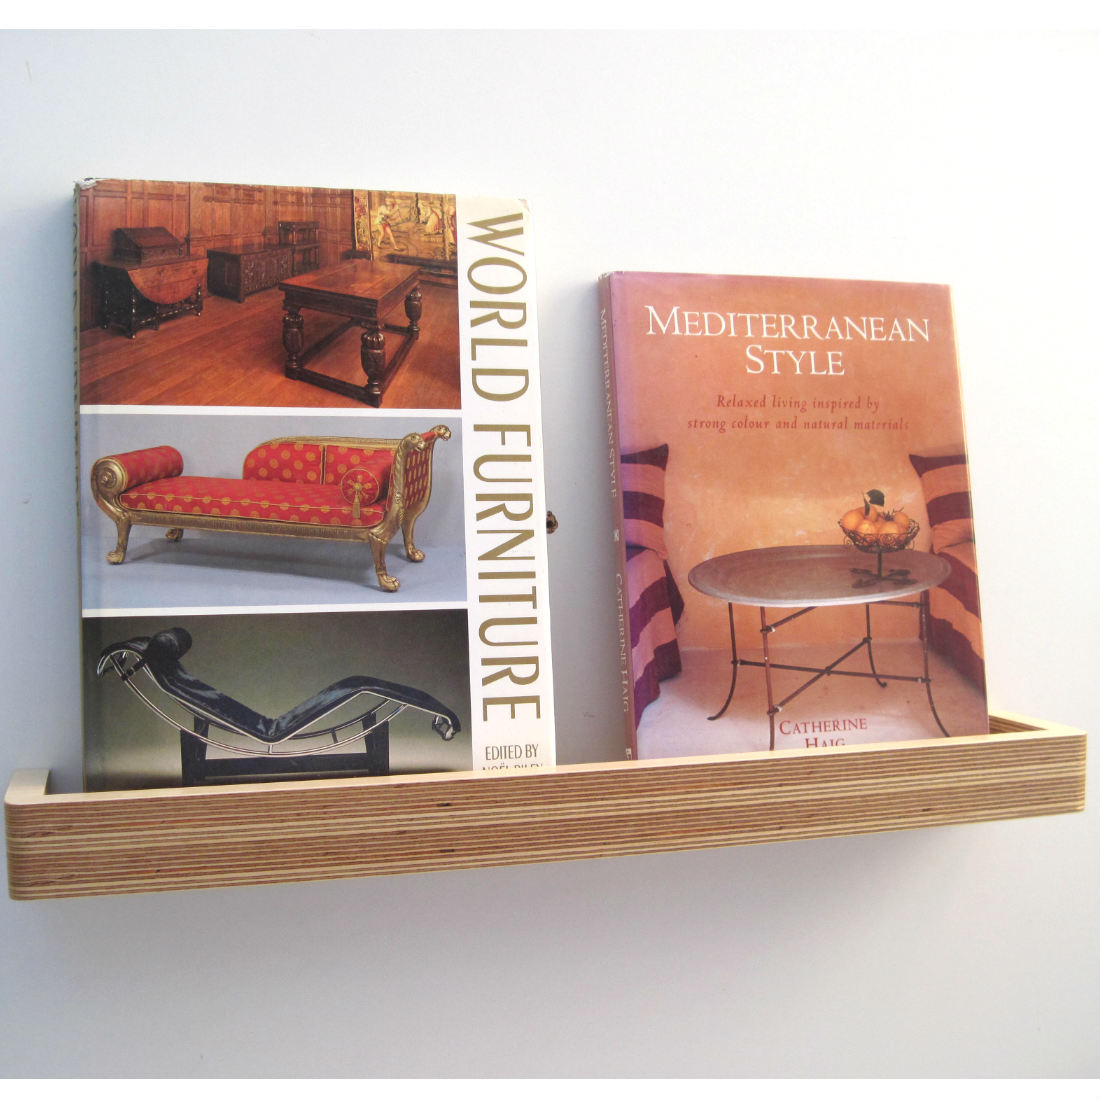 Slimline Floating Shelf Homeware Furniture And Gifts